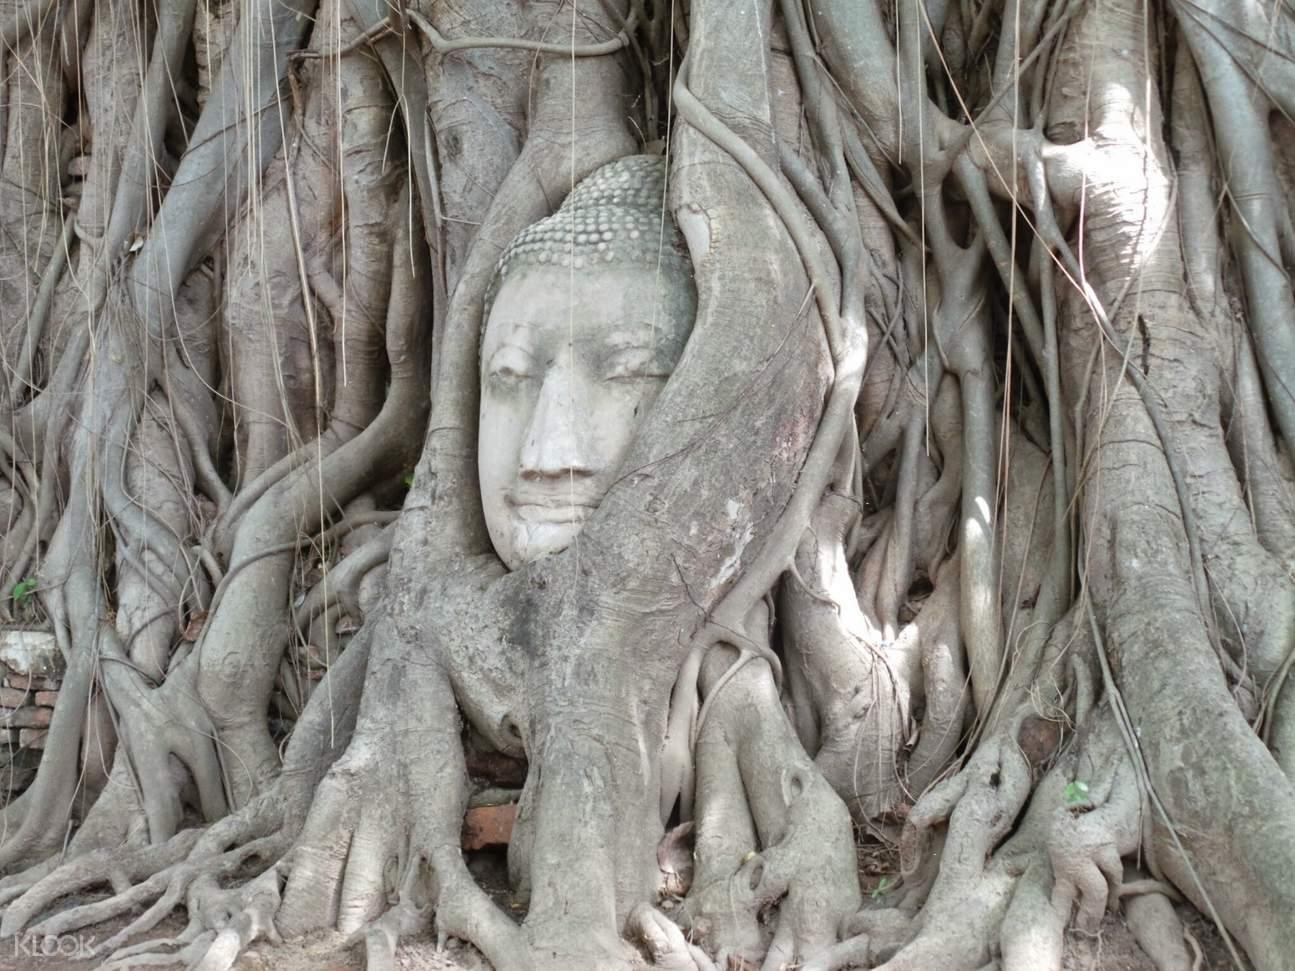 Buddha Head in Tree Roots at Wat Mahathat